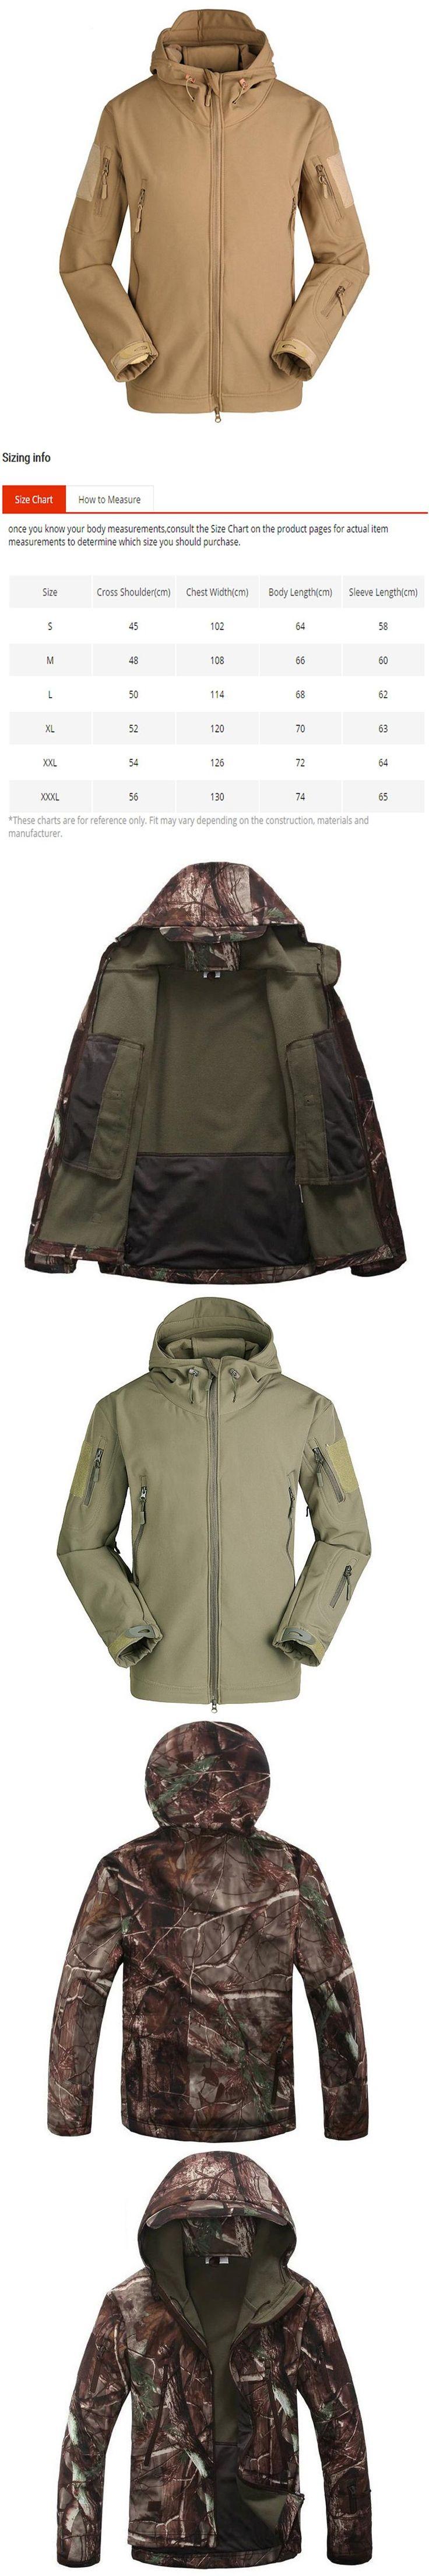 Tactical Jacket Men Lurker Shark Skin Softshell V4 Military Jackets Mens Waterproof Thick Warm Camouflage Coat TAD Camo Raincoat